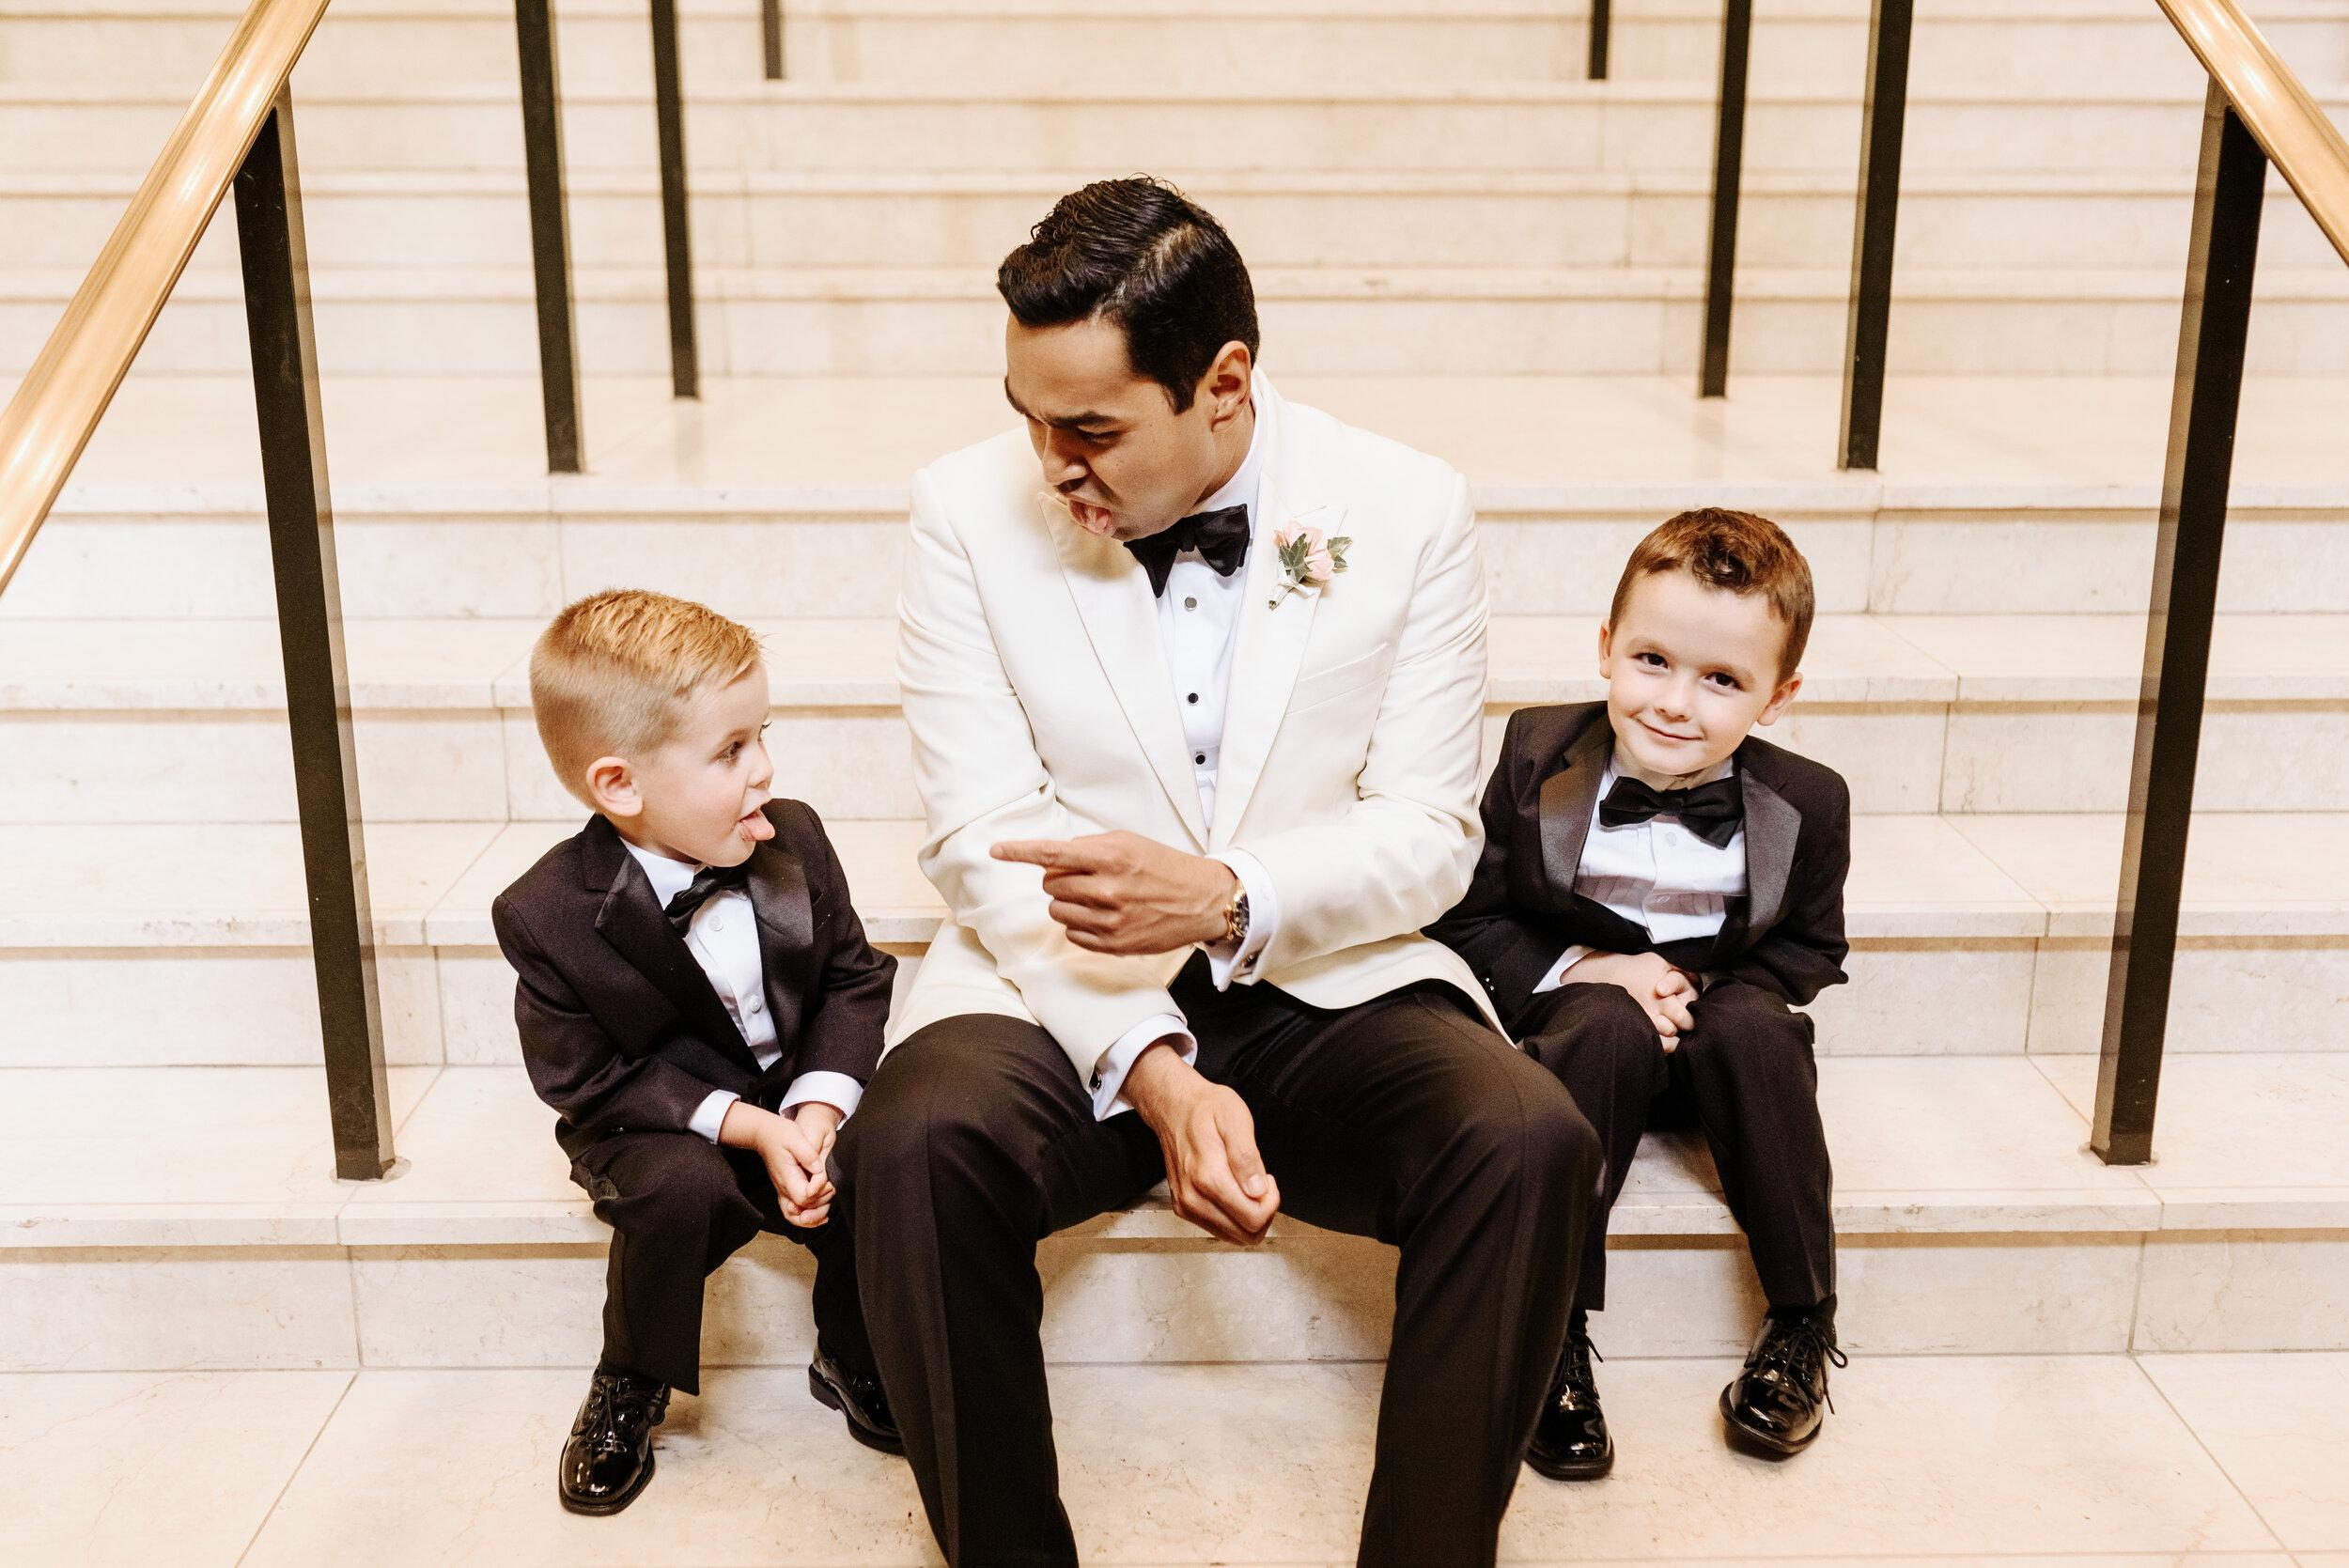 Cassie-Mrunal-Wedding-Quirk-Hotel-John-Marshall-Ballrooms-Richmond-Virginia-Photography-by-V-55.jpg